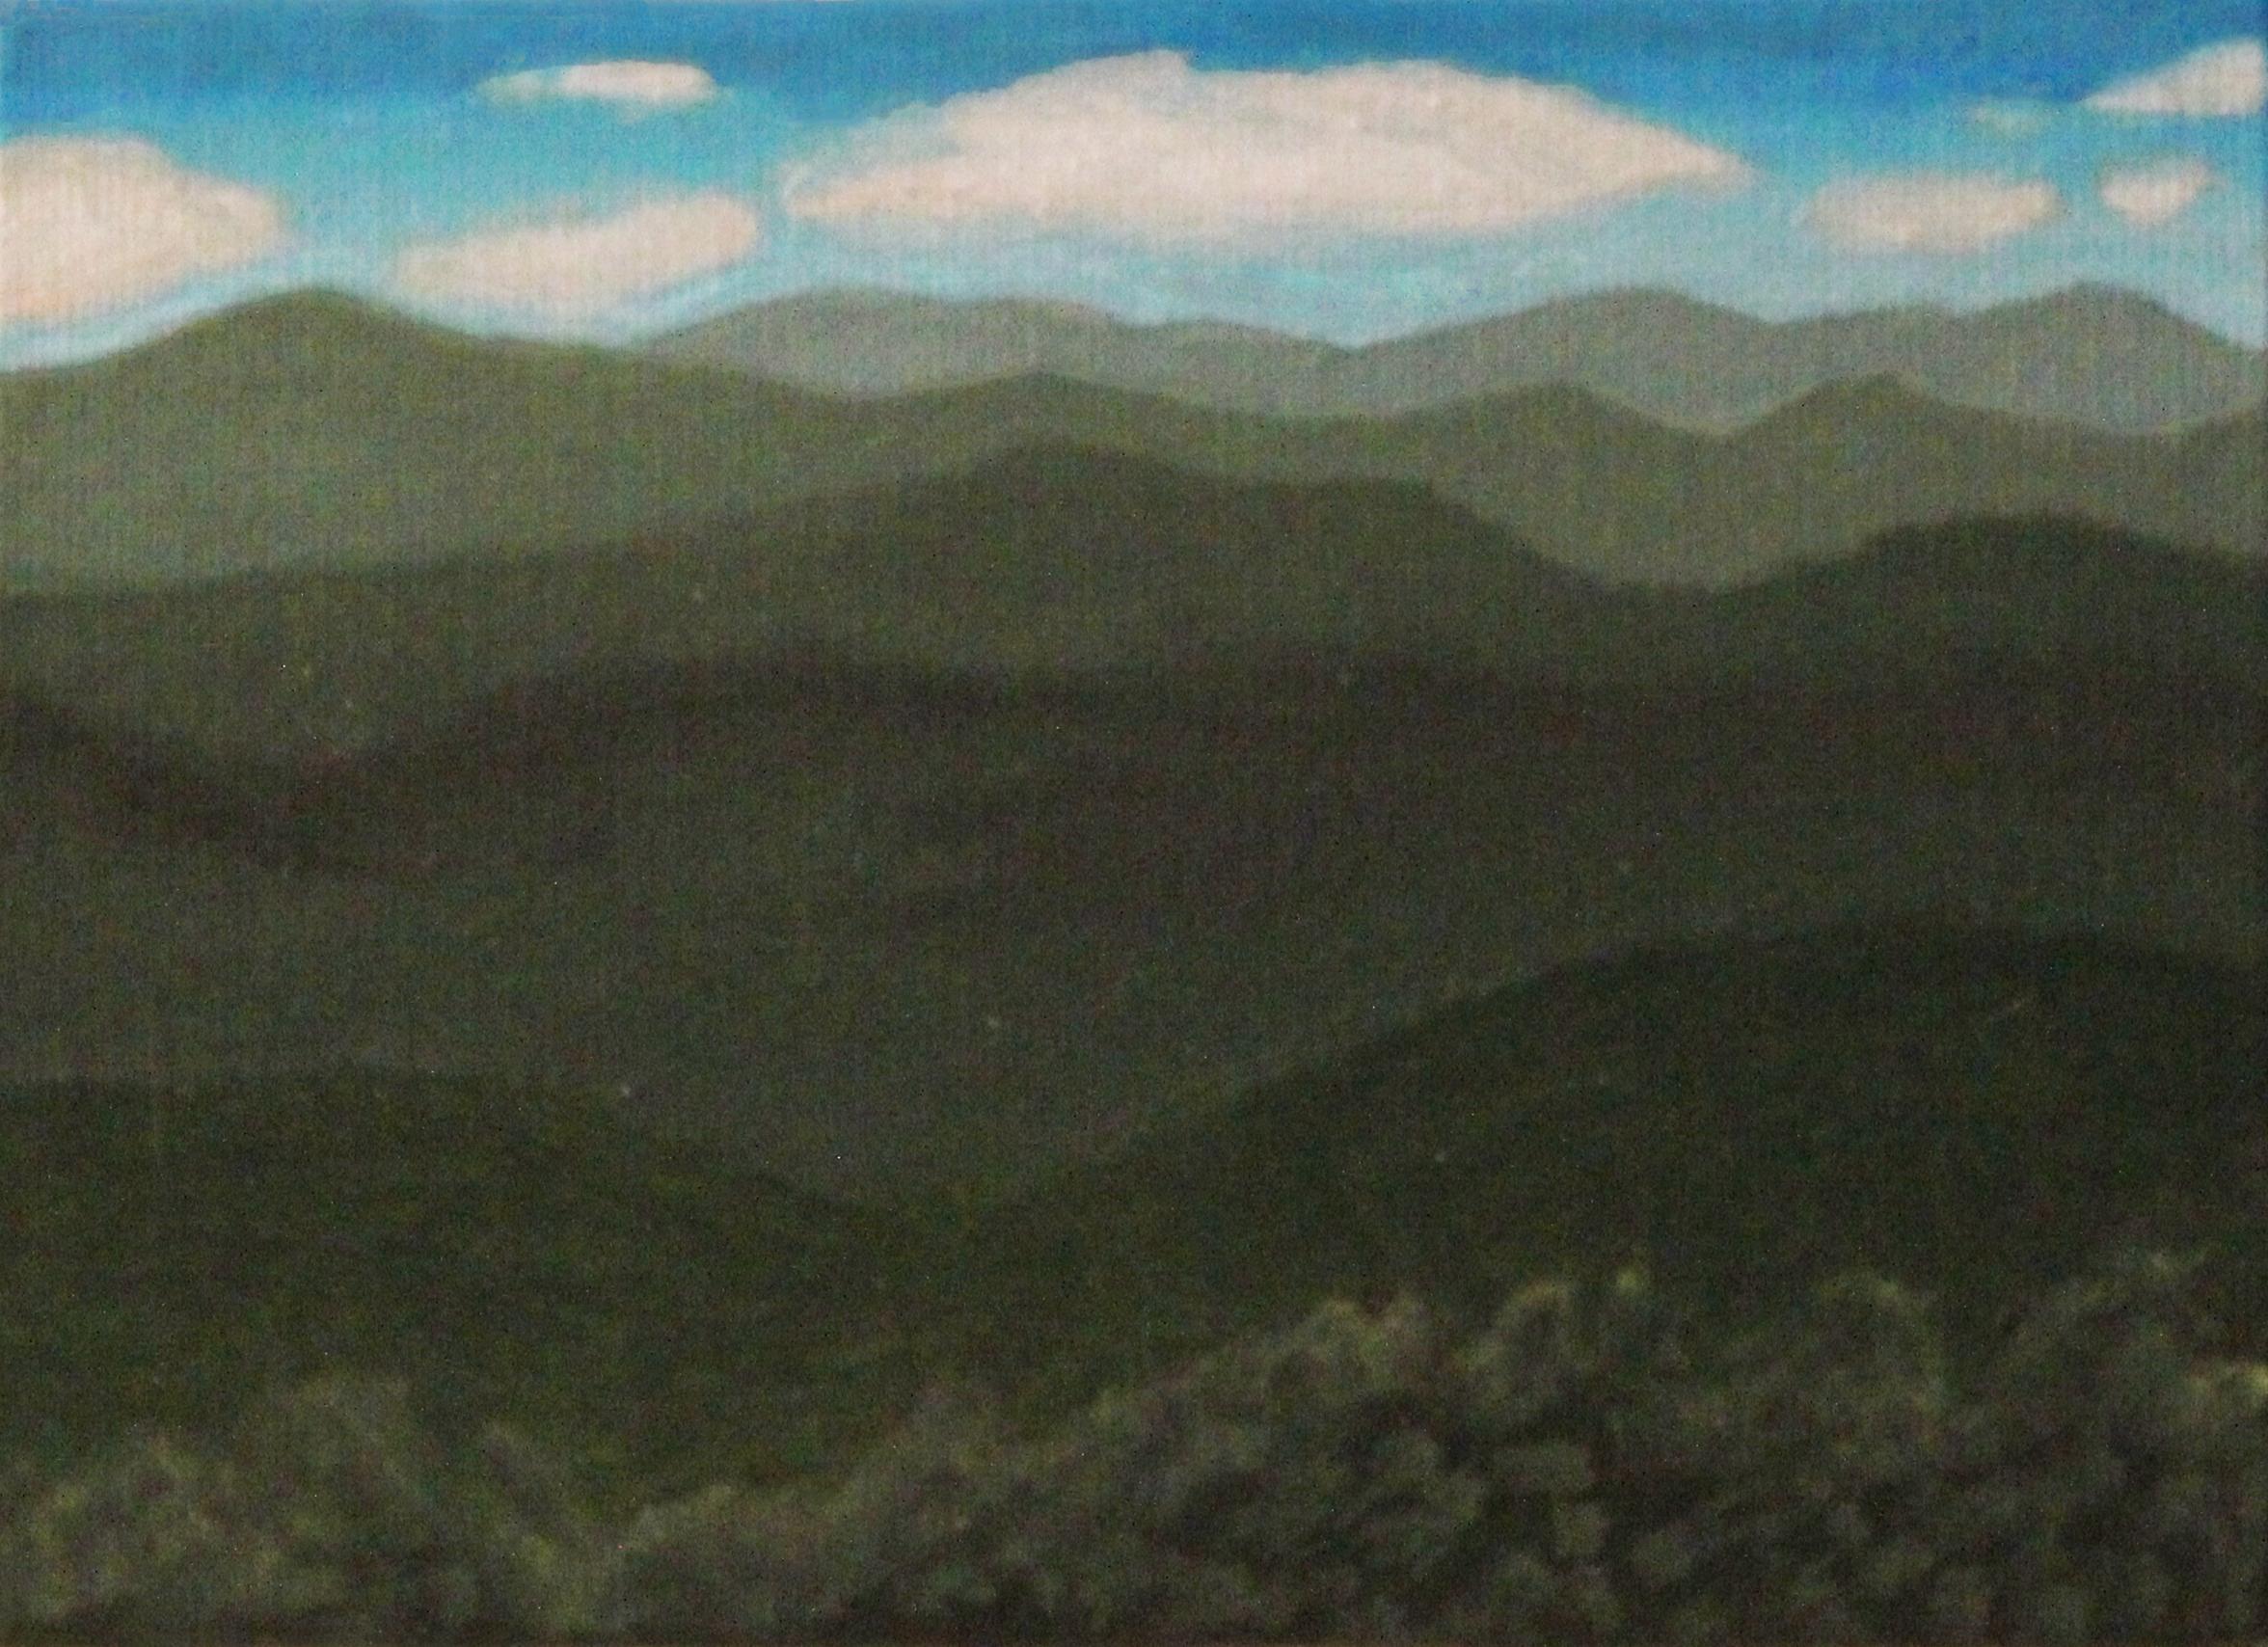 Mount Agamenticus Summit by Magenta-Fantasies